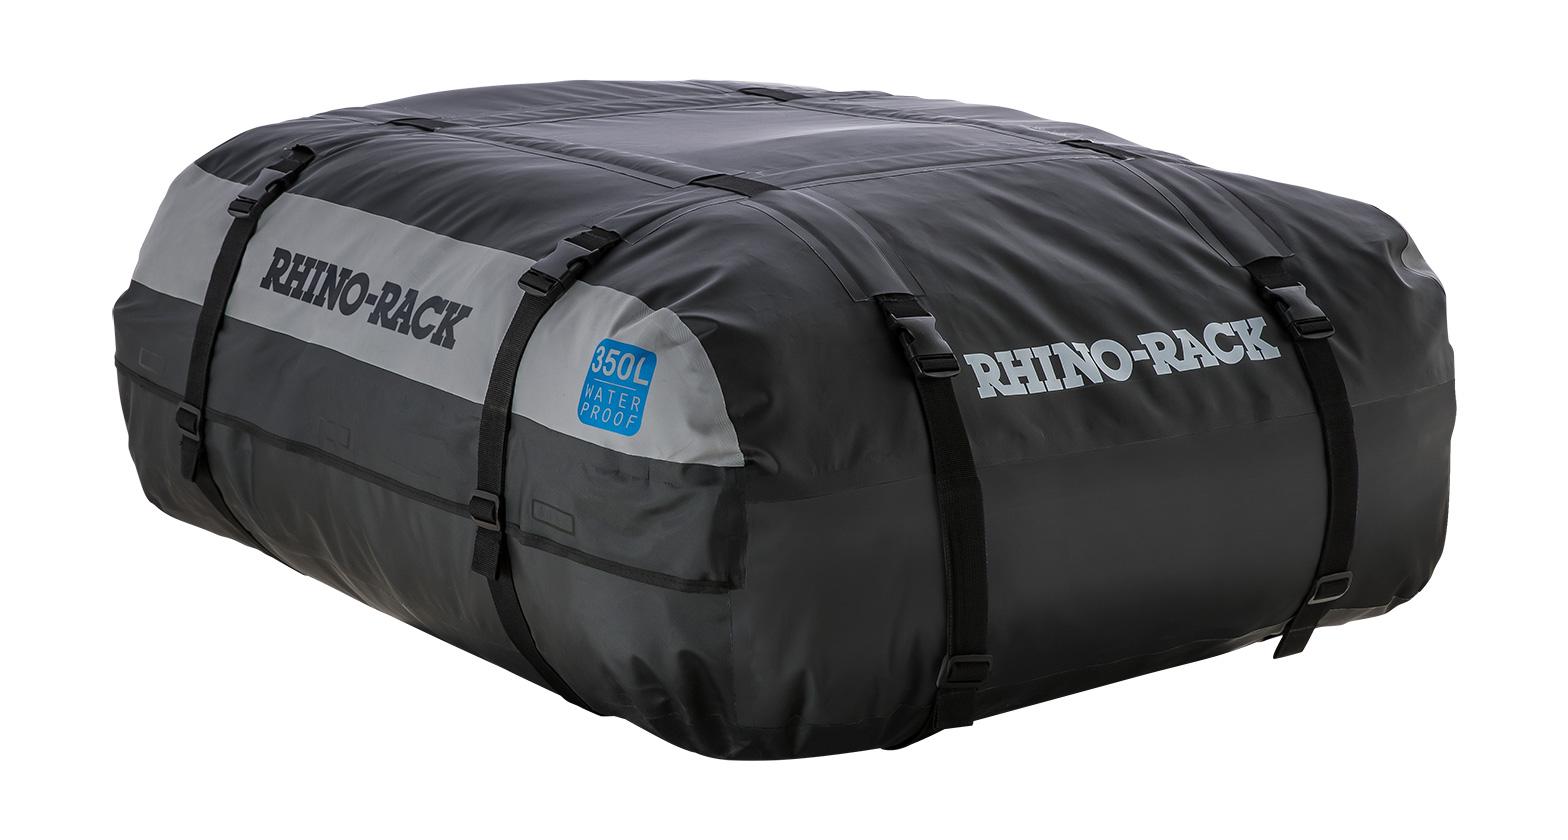 #LB350 - Weatherproof Luggage Bag (350L) | Rhino-Rack